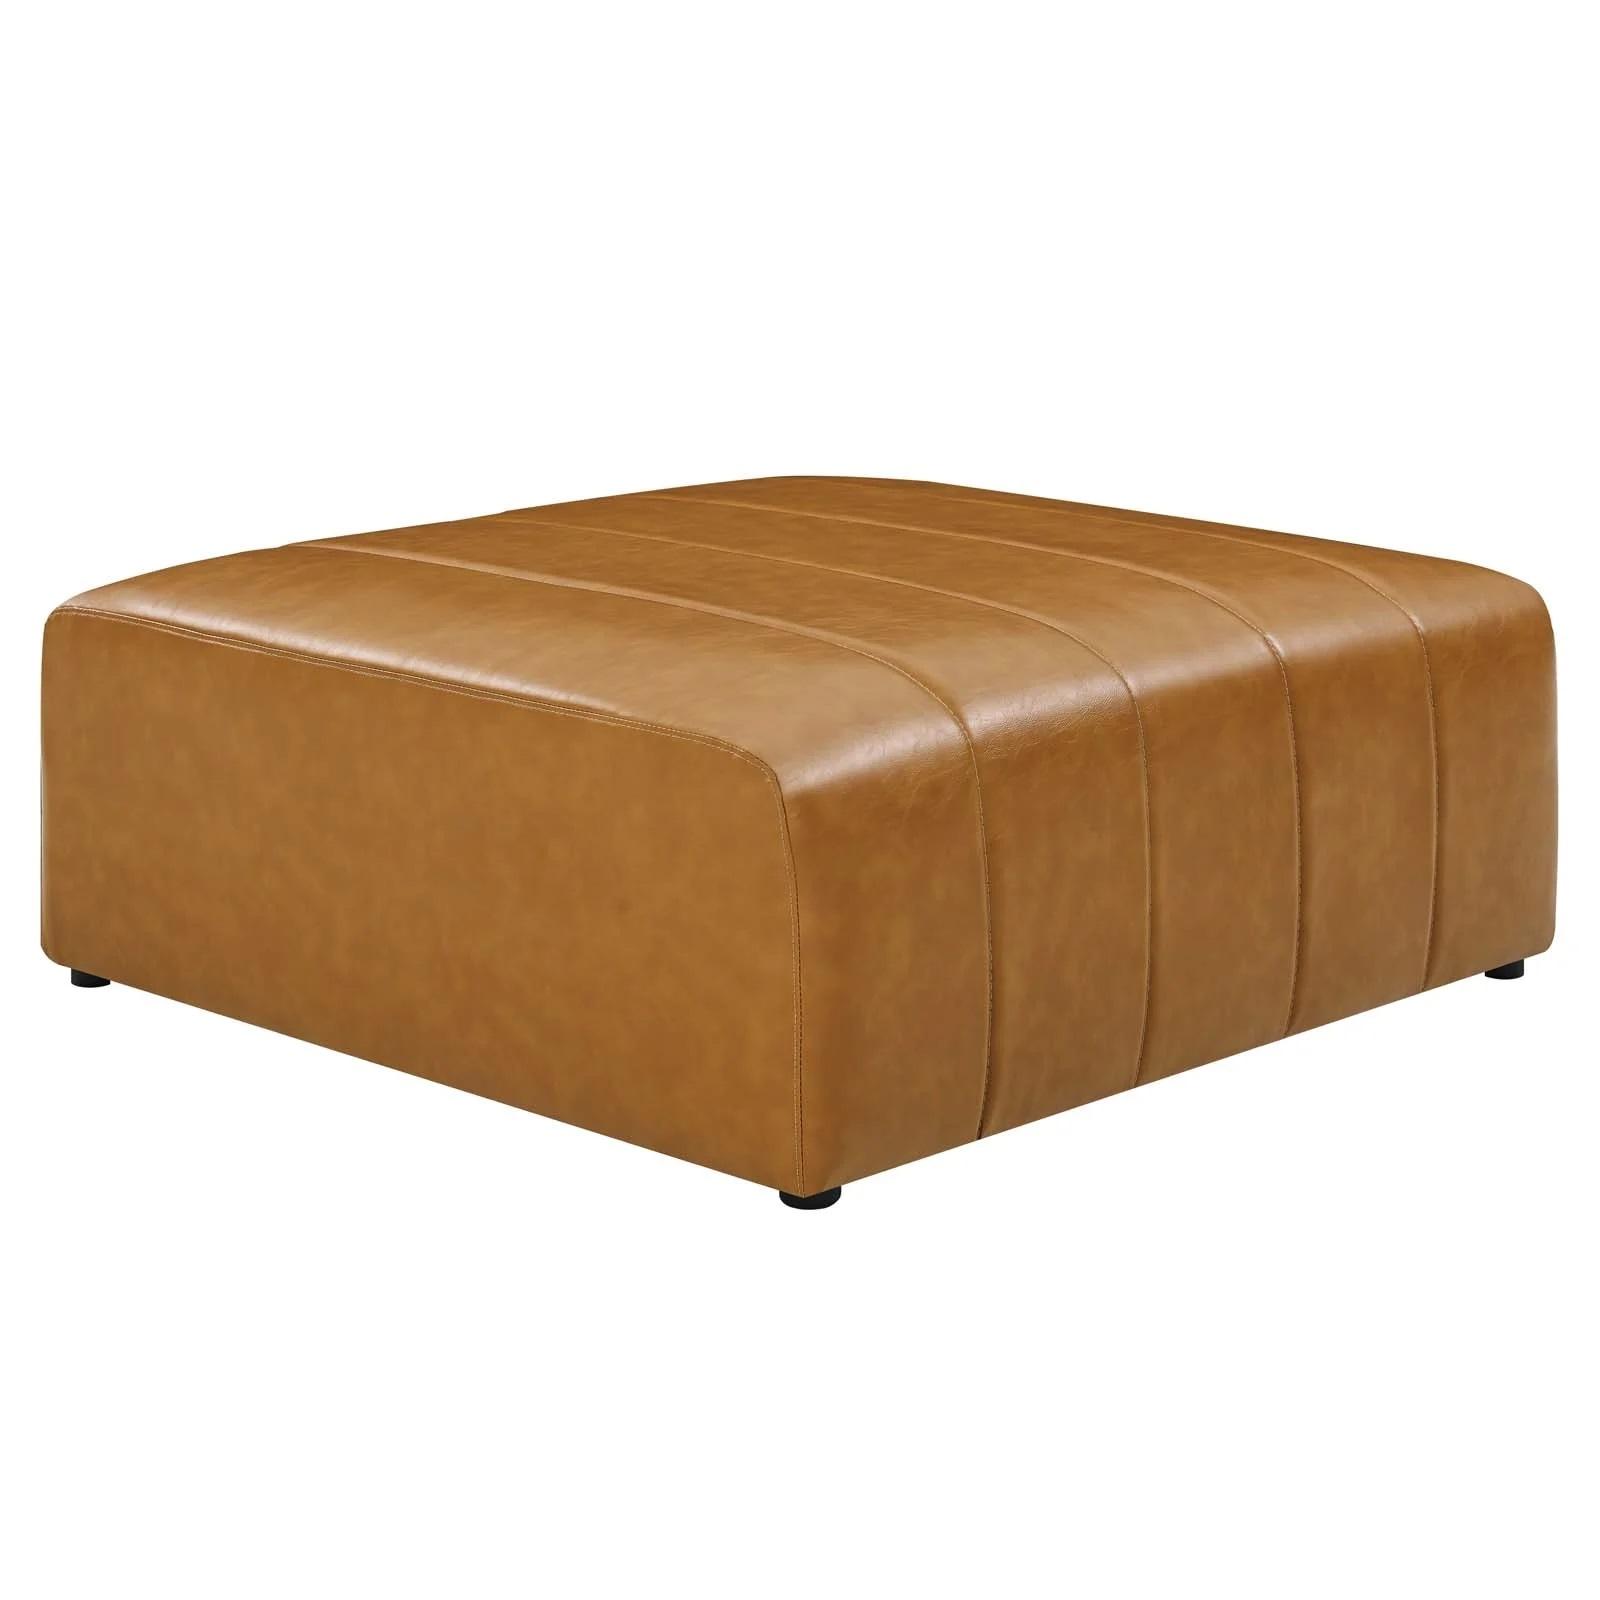 Bartlett Vegan Leather Ottoman in Tan